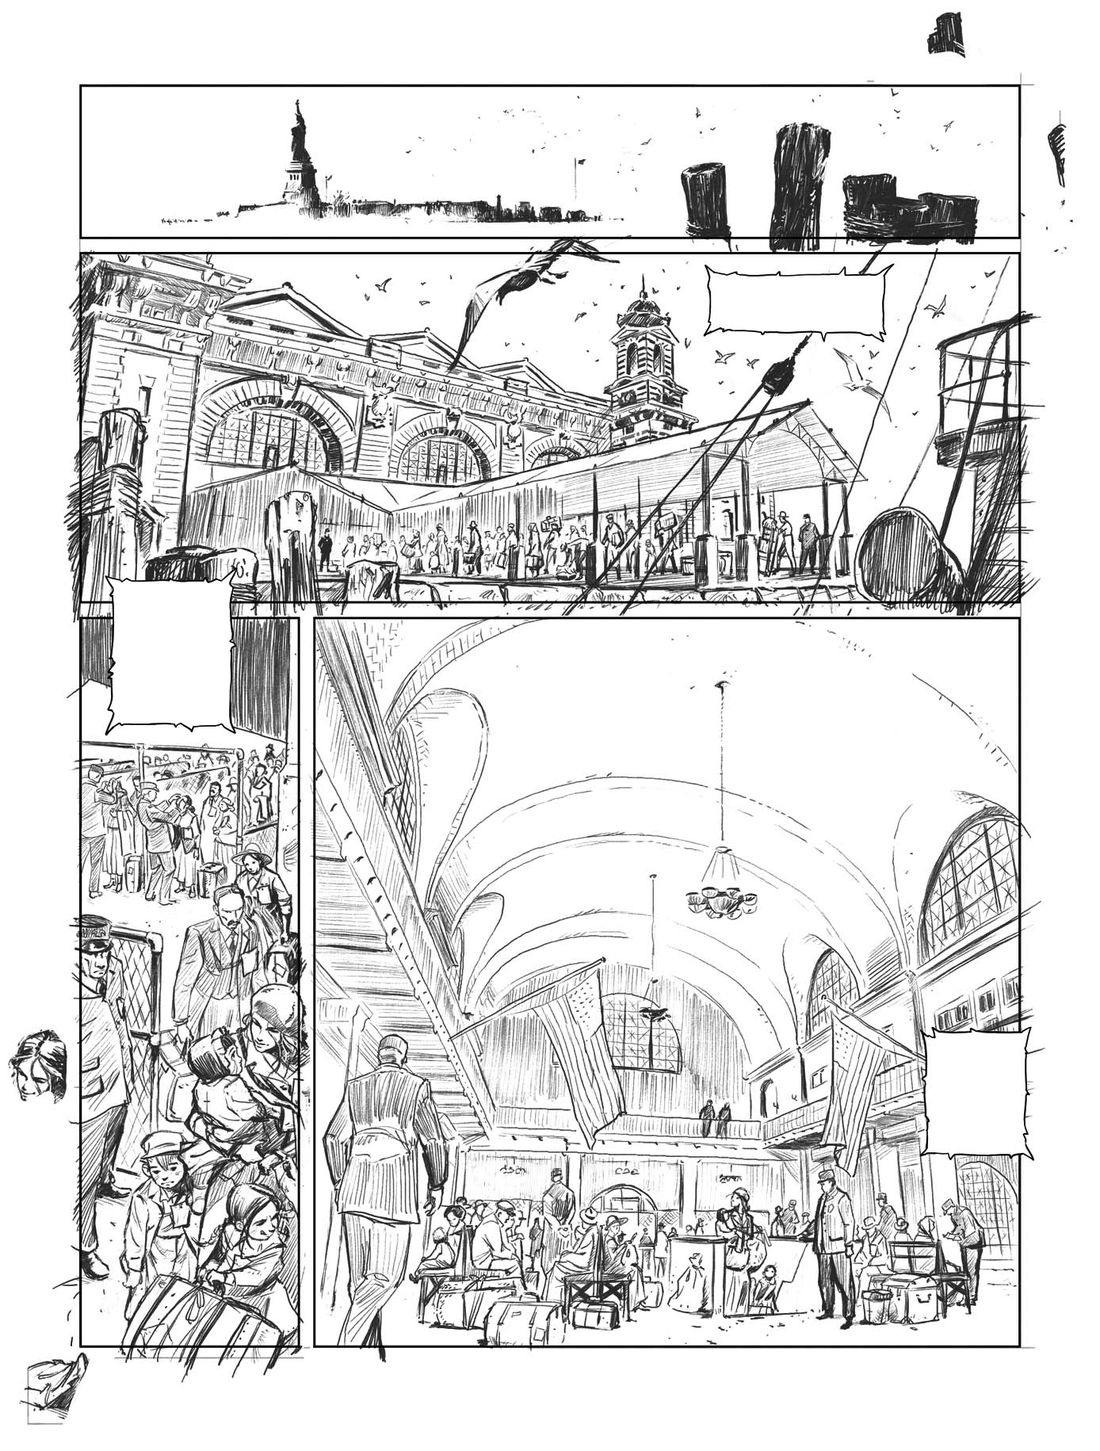 Giant, Work in Progress [2/4] © Mikaël